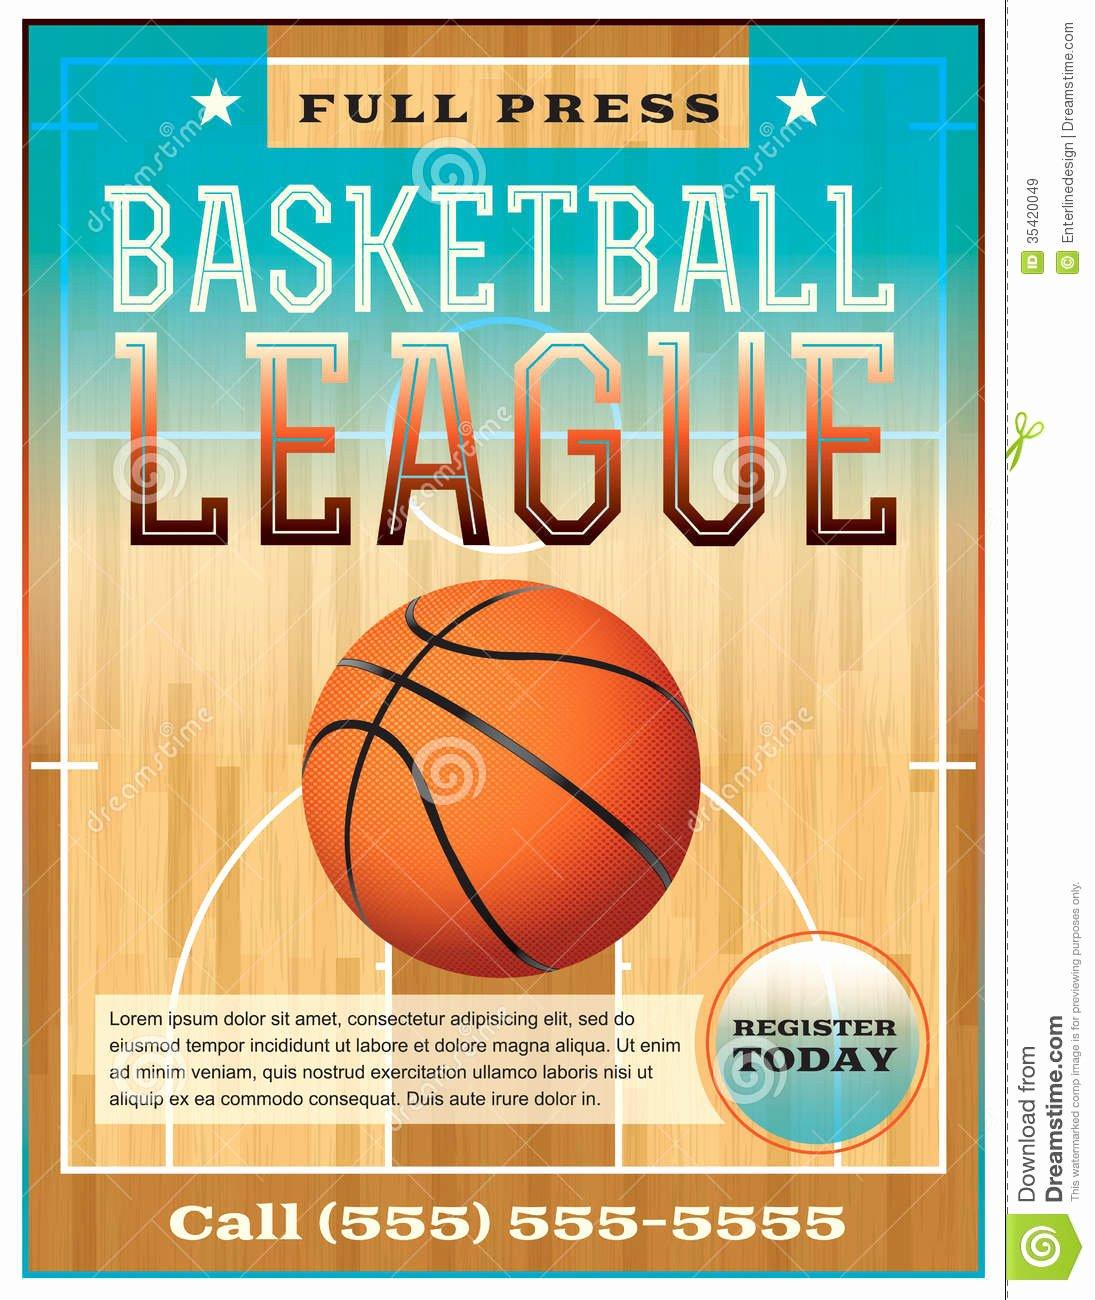 Basketball Camp Flyer Template Lovely Basketball League Flyer Stock Vector Image Of Flyer